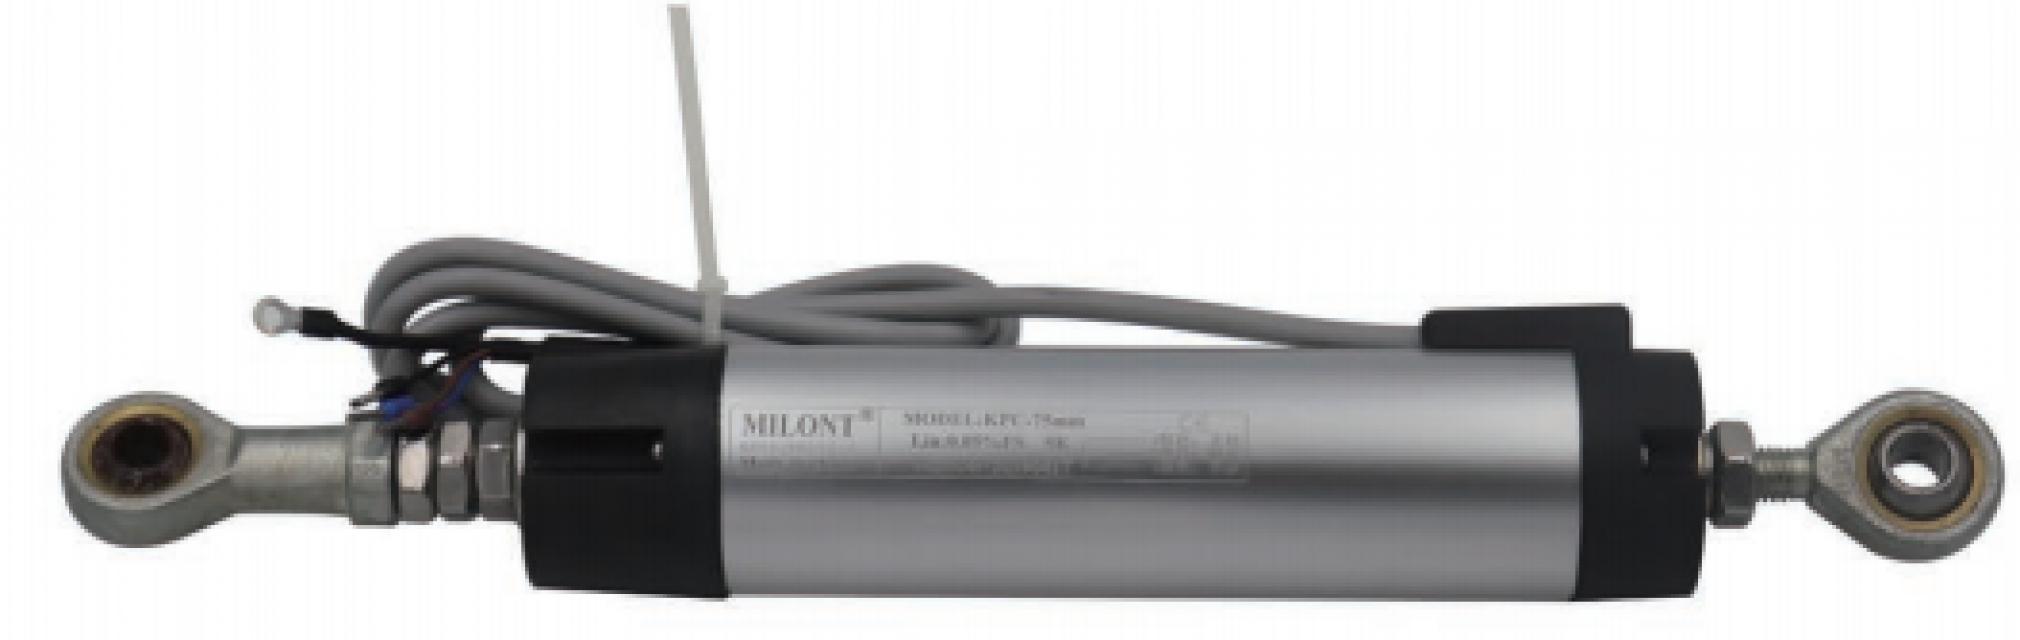 Linear displacement sensor  KPC series 1250mm